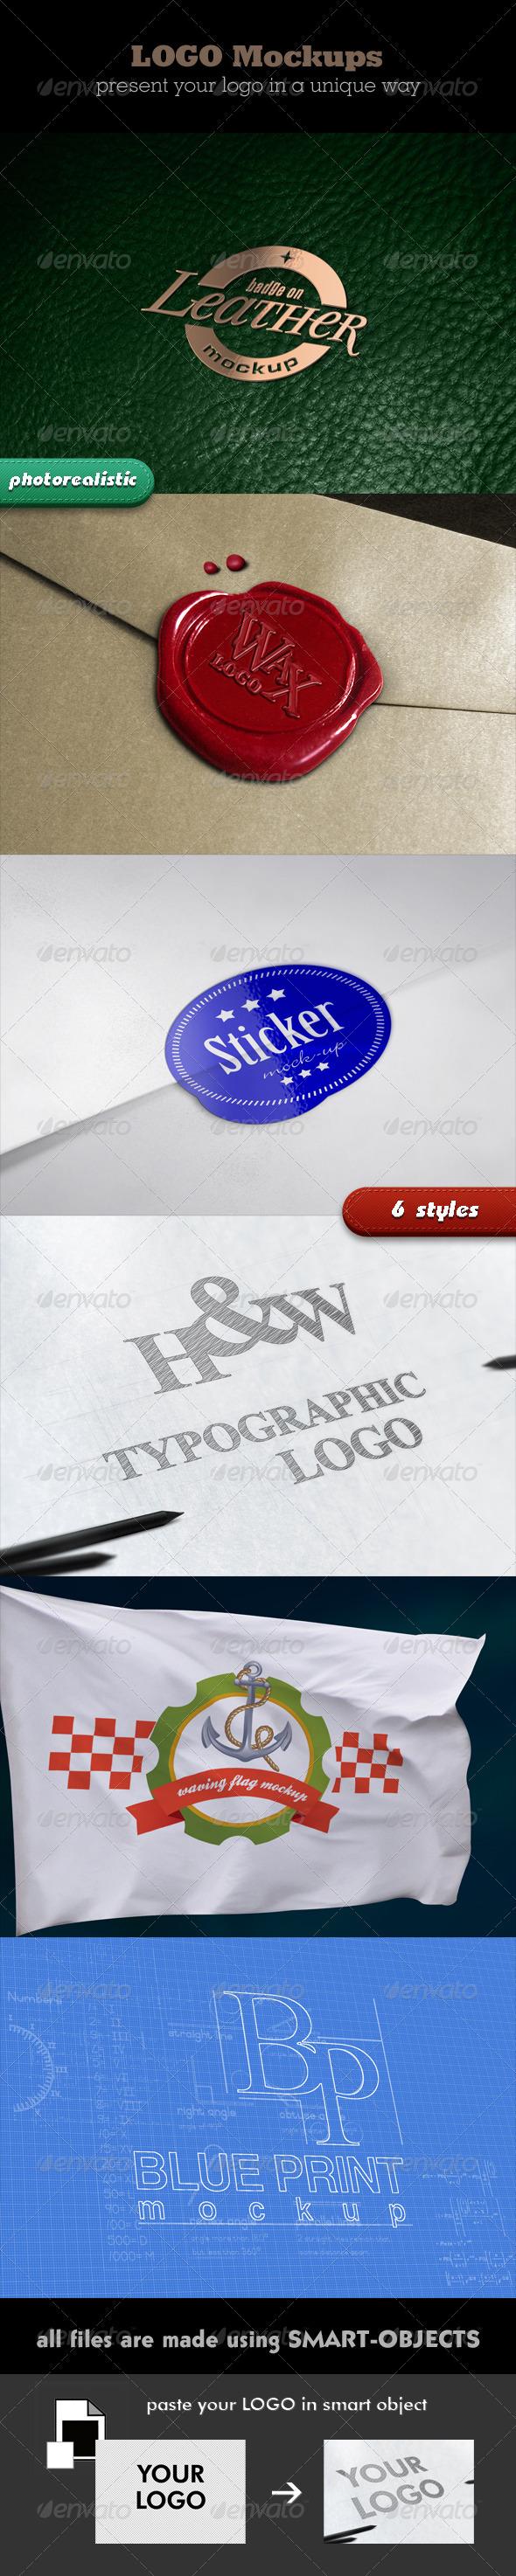 GraphicRiver Photorealistic Logo Mockups 2507323